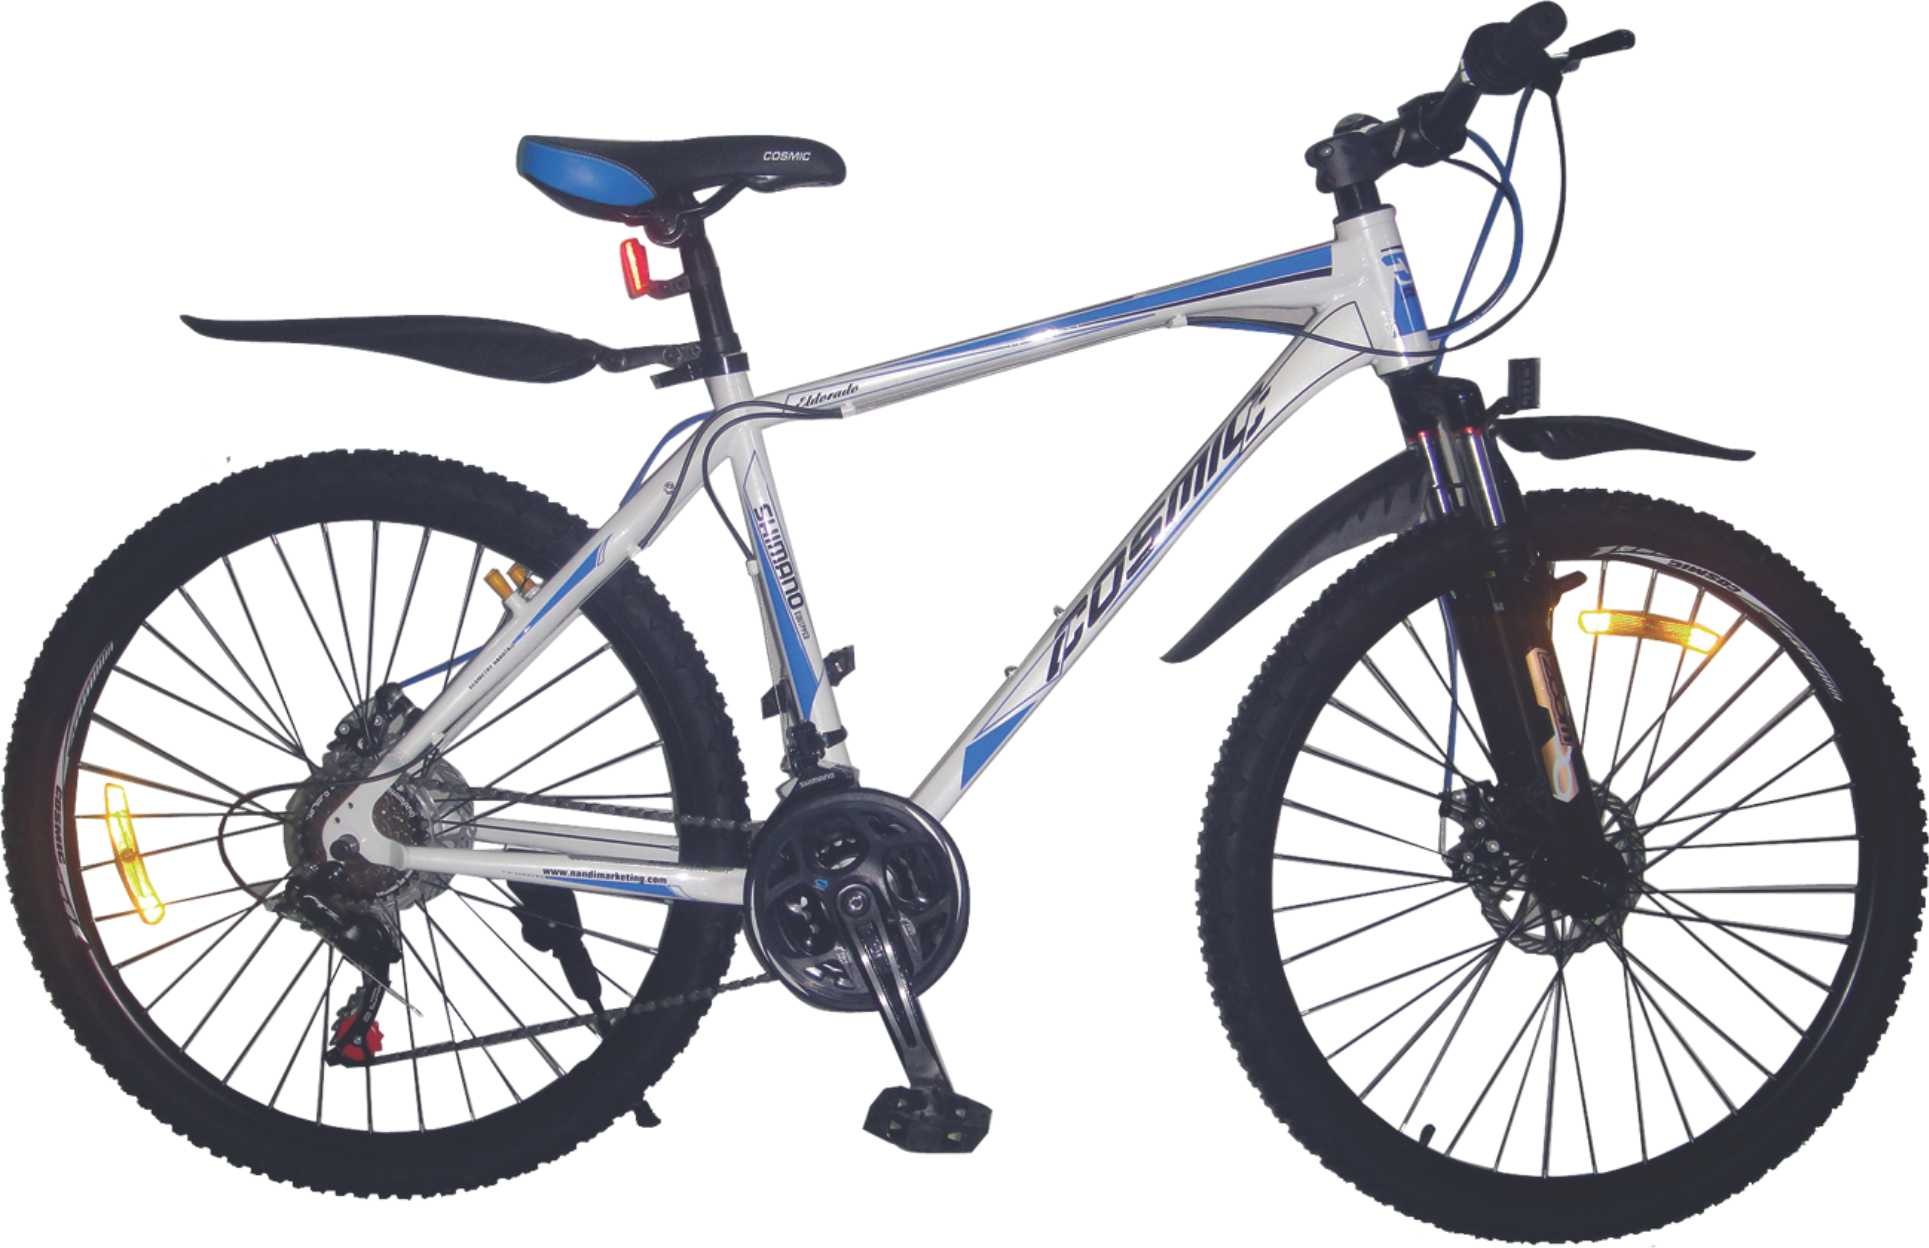 7e7bc050b69 Cosmic Eldorado Classic 26 - 18 Speed - 2015 Cycle Online